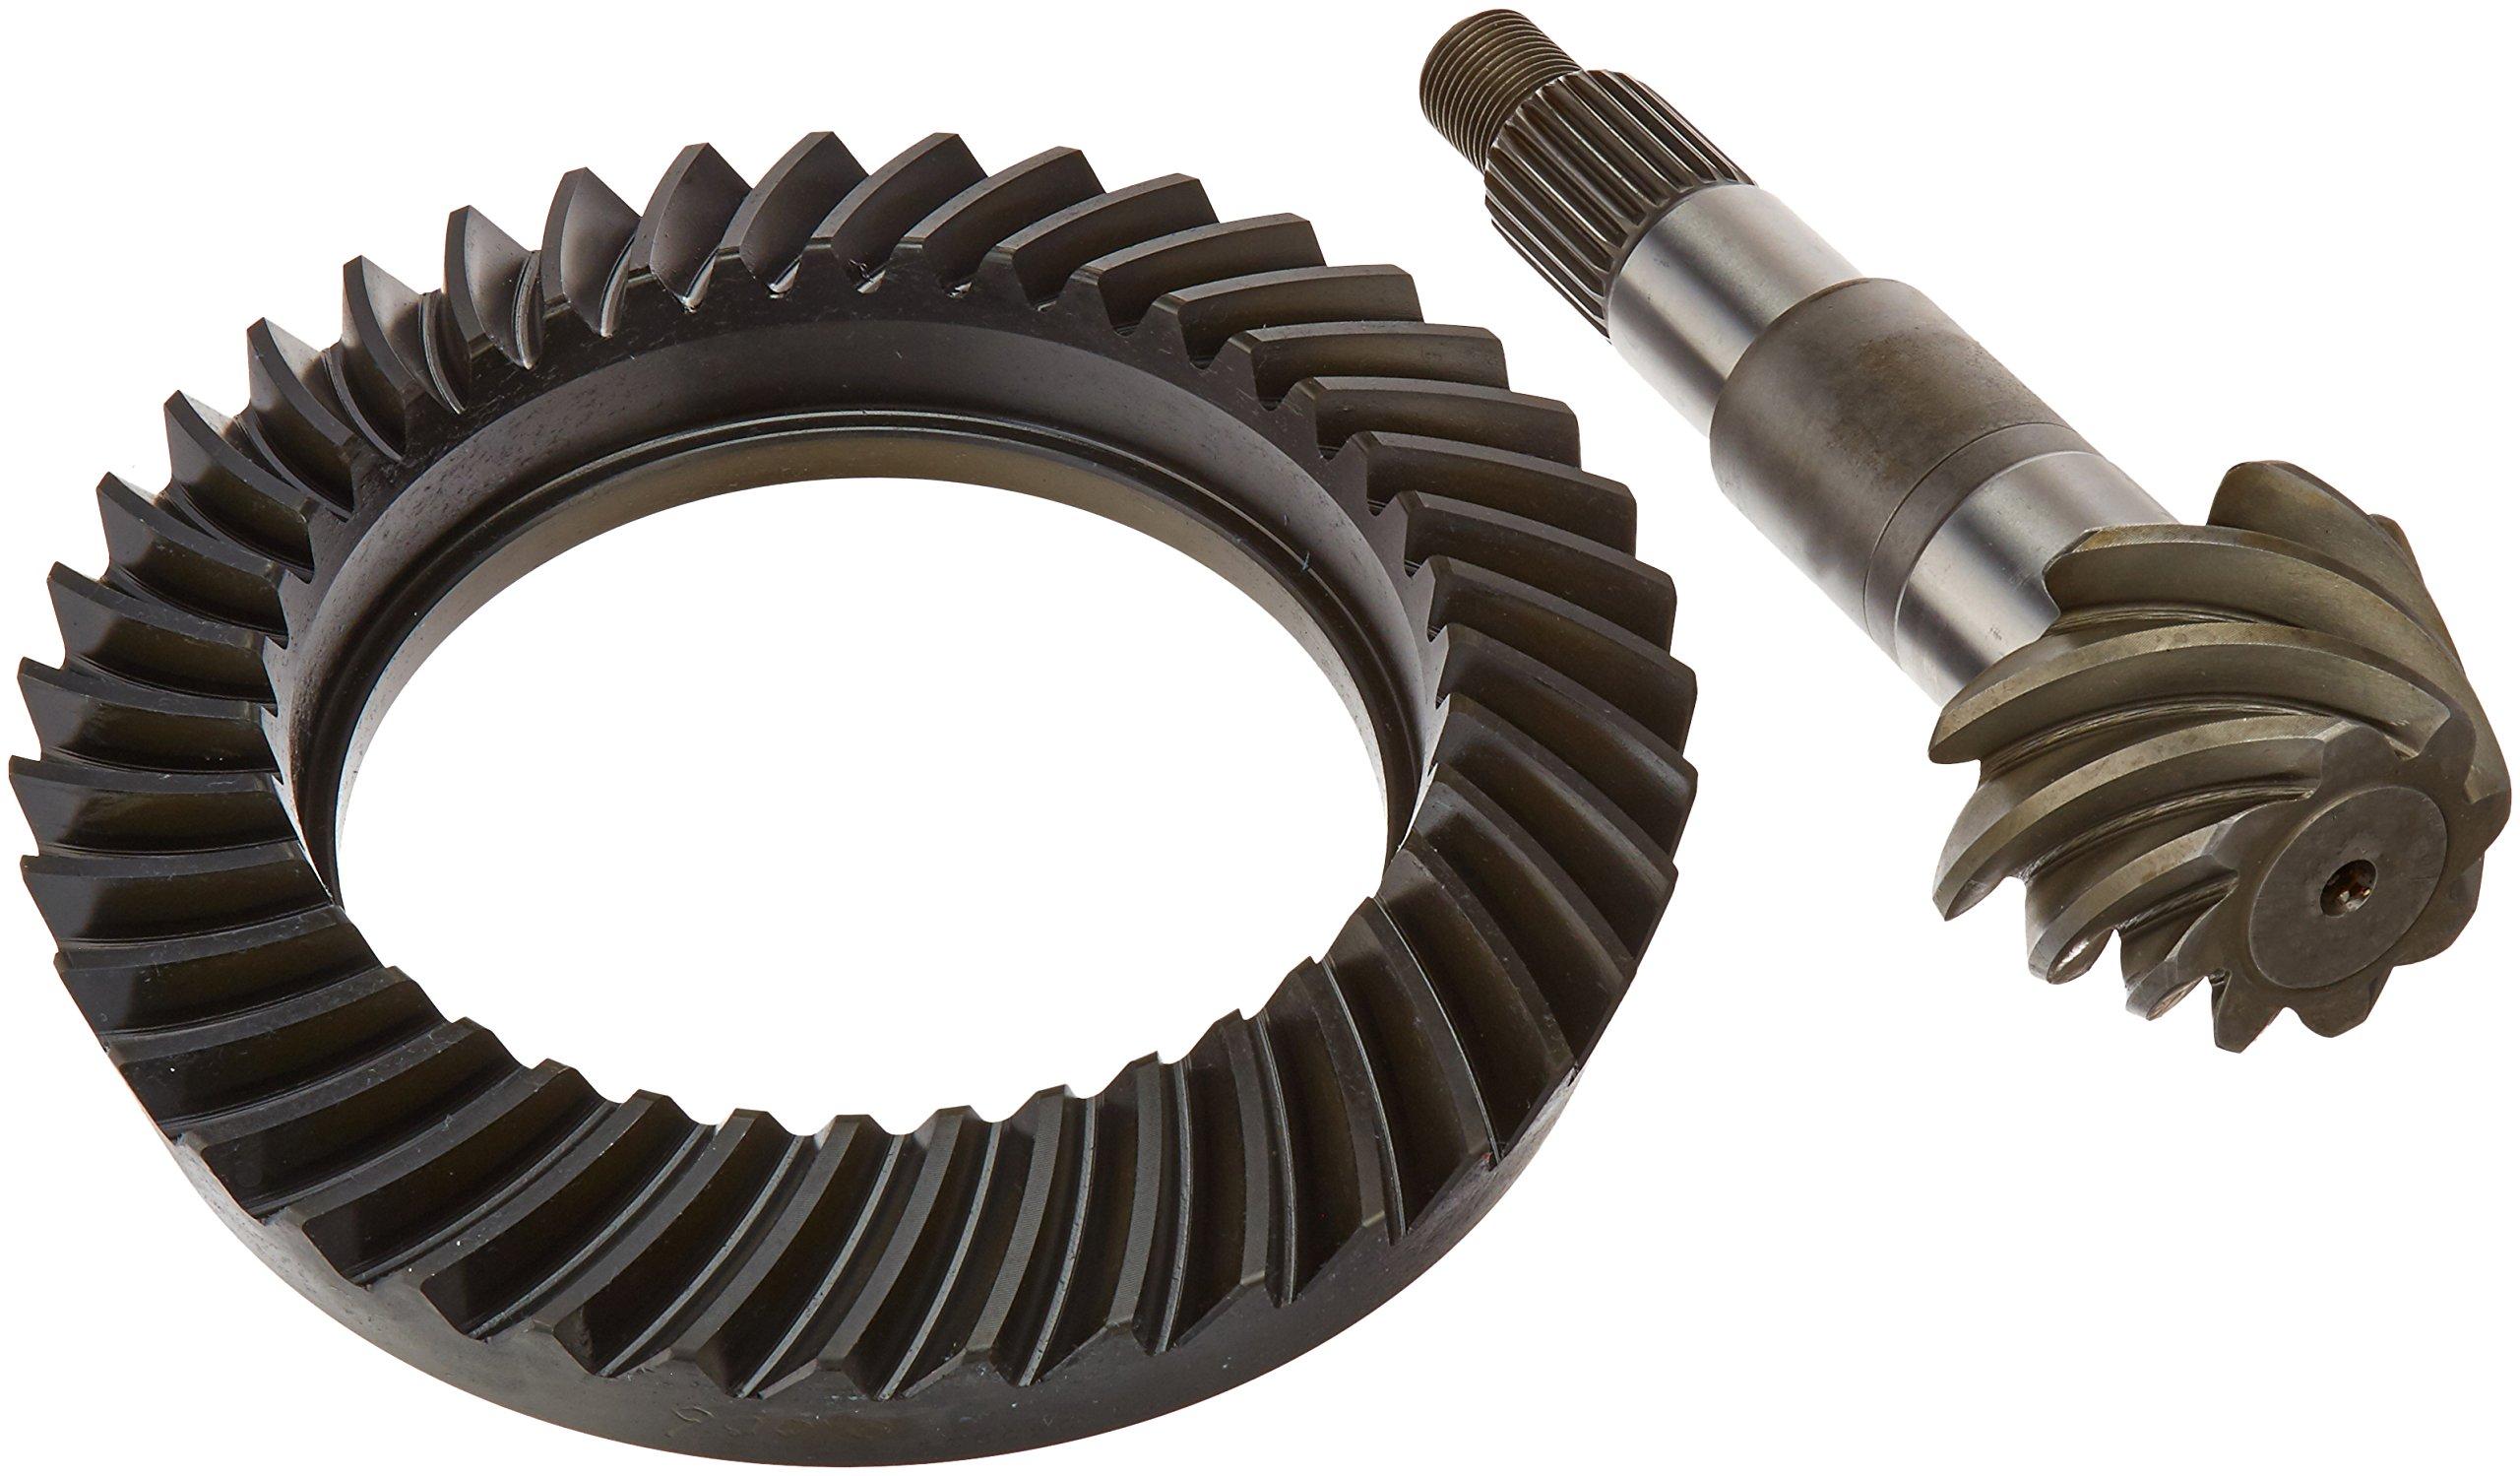 Motive Gear D44-488JK Ring and Pinion (DANA 44 Style, 4.88 Ratio, JK)